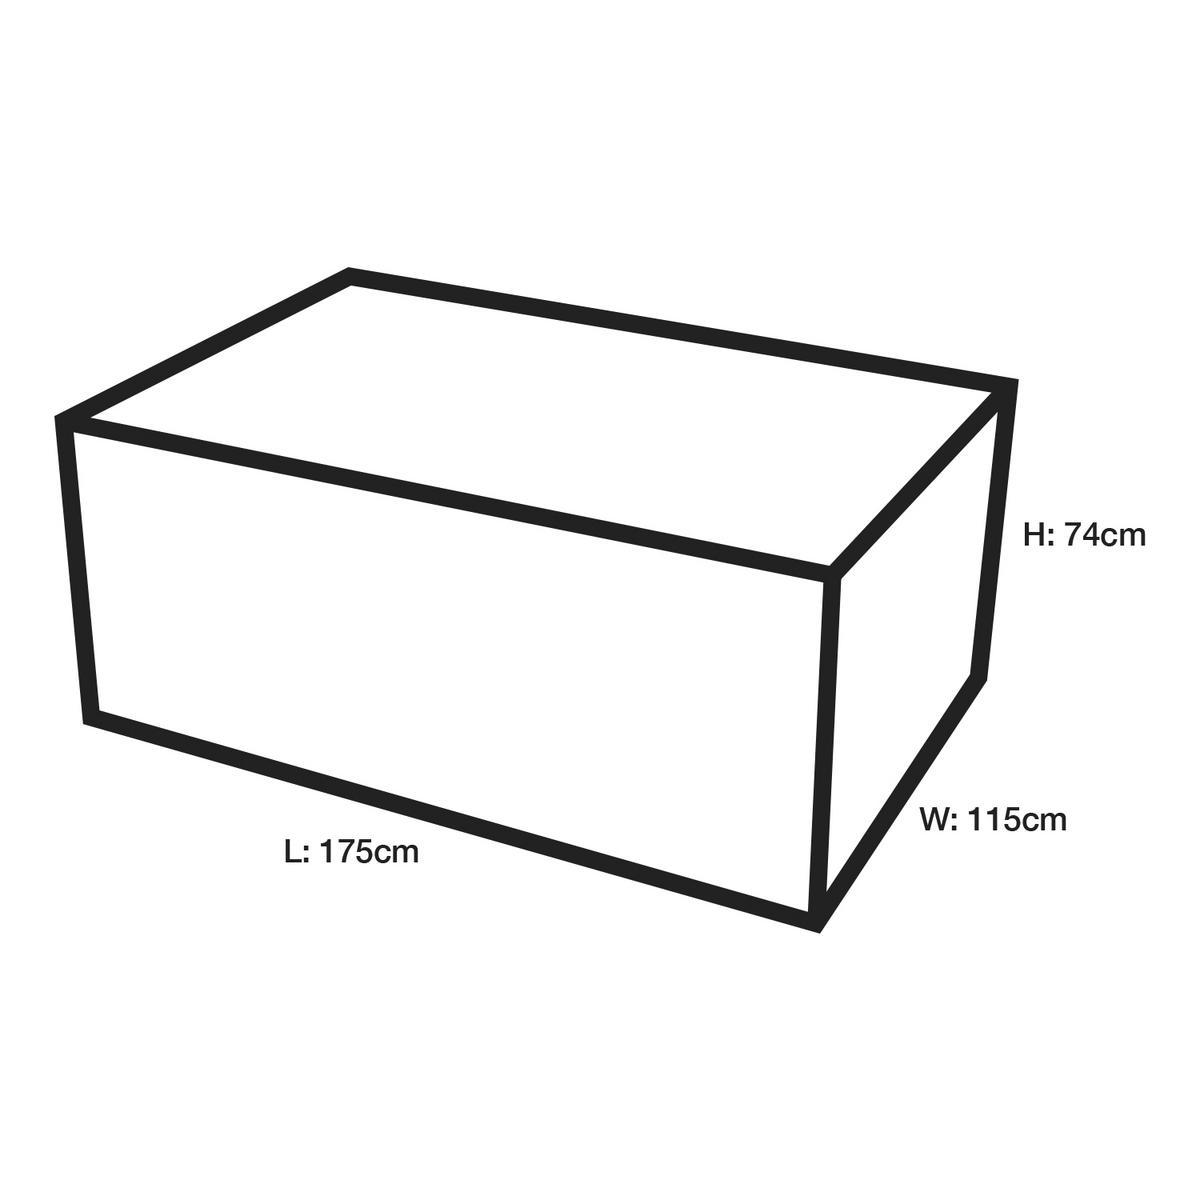 Woodside Black Rattan Furniture Set Cover 115x175x74cm